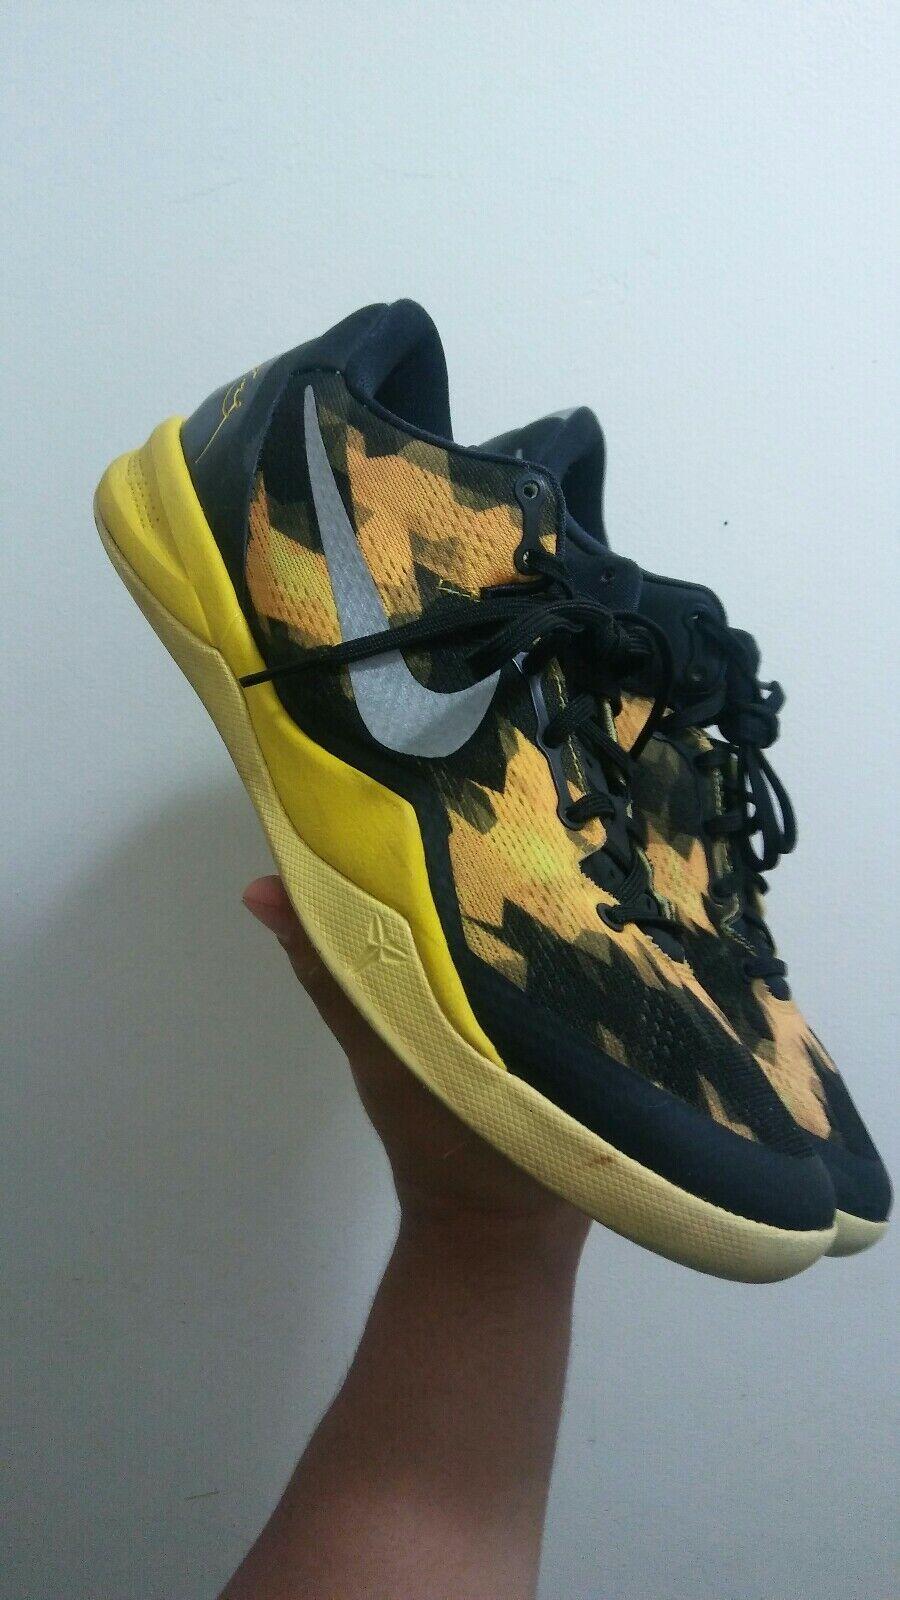 Nike Kobe 8 Electric Yellow Blitz Size 10.5